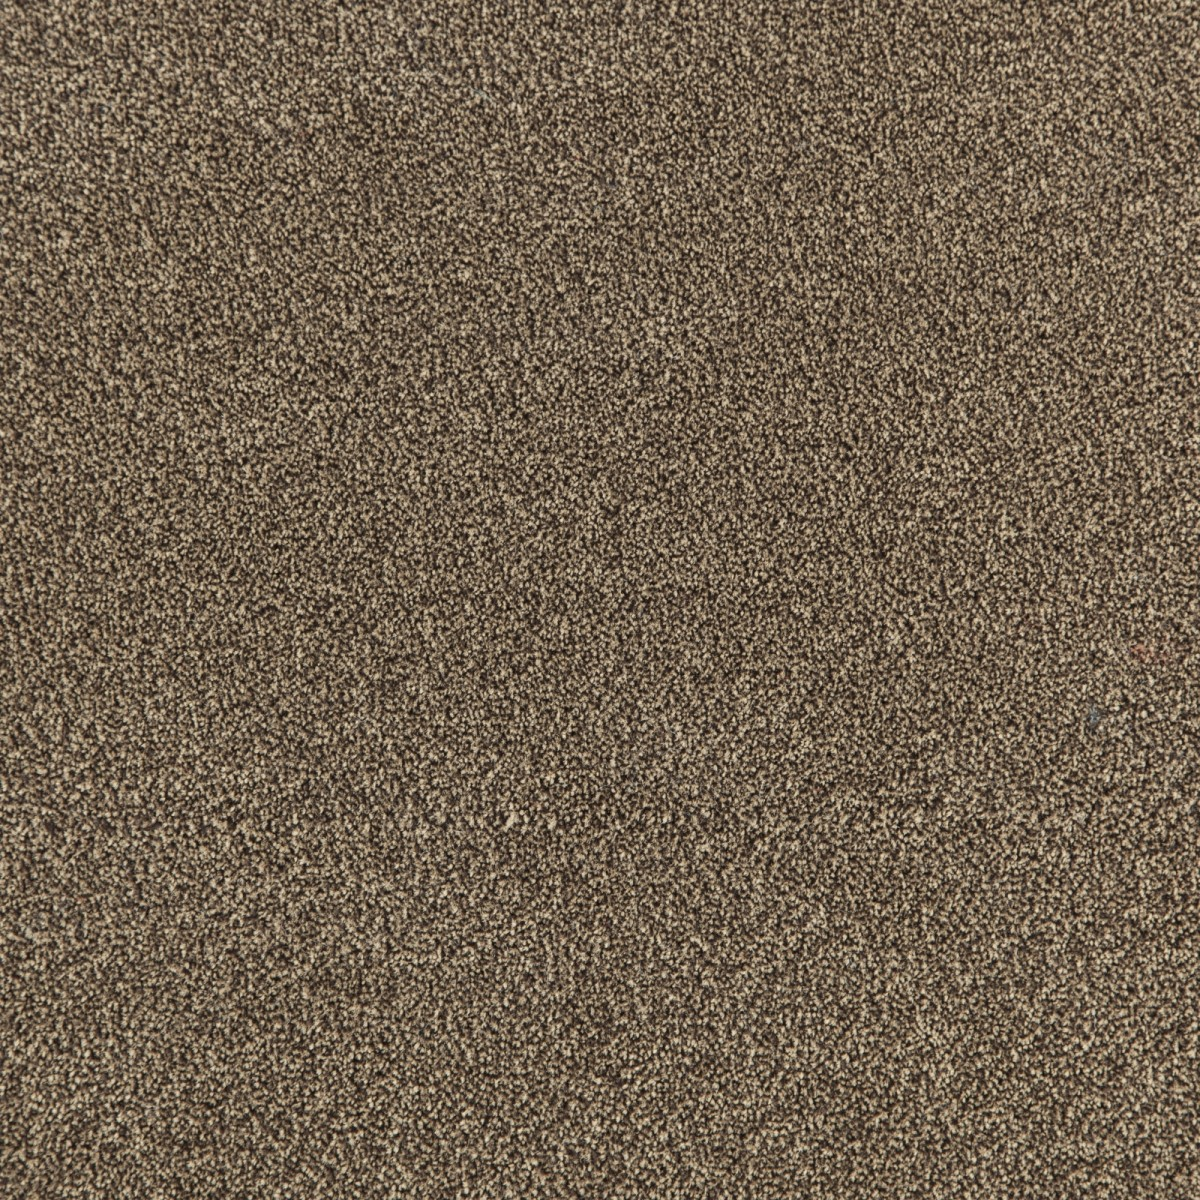 AV60230